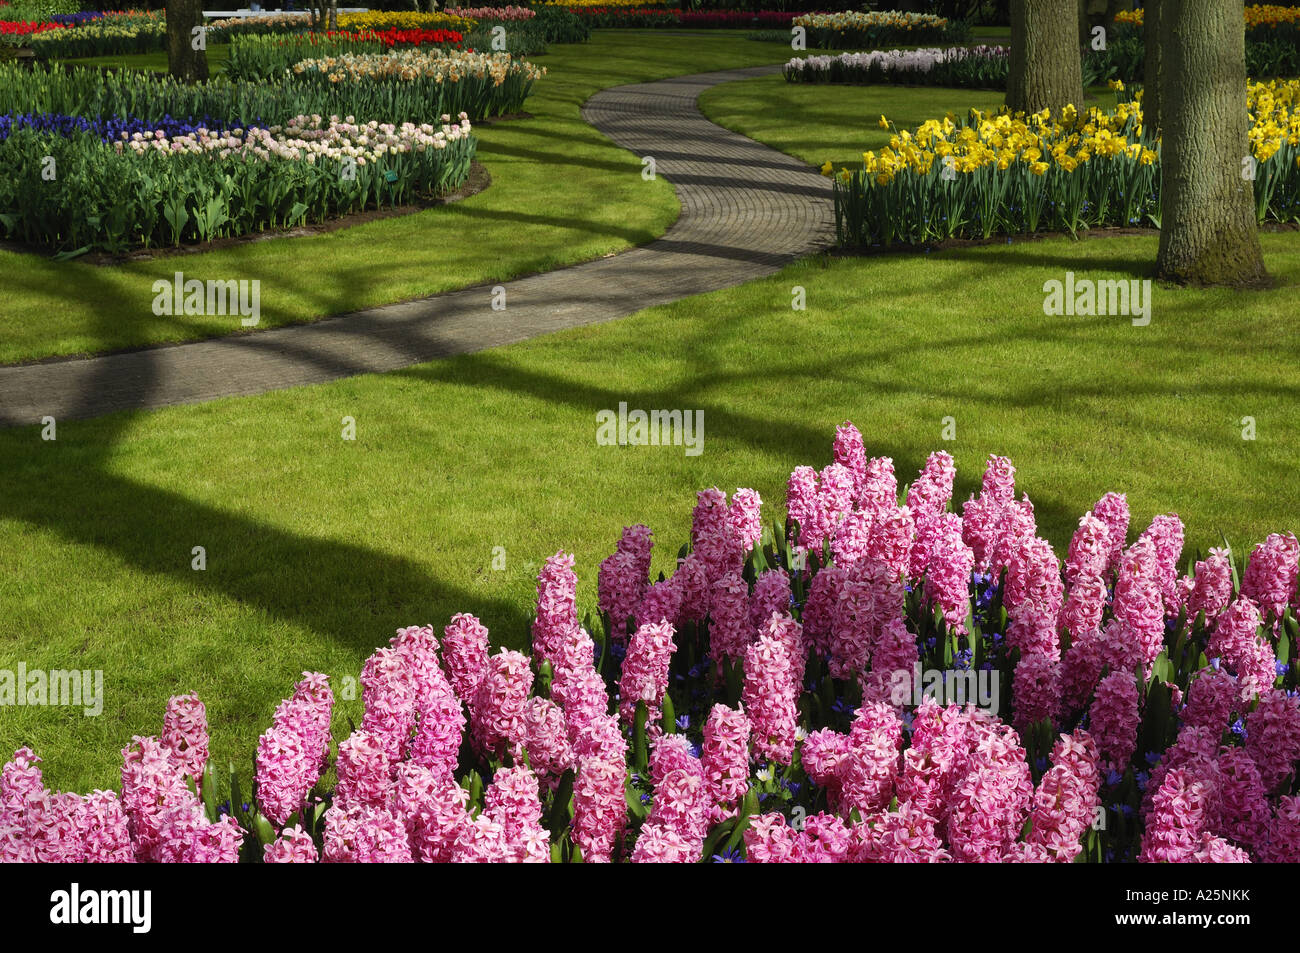 Jacinthe (Hyacinthus orientalis), park with flowerbeds and lawns, Netherlands, Keukenhof Stock Photo